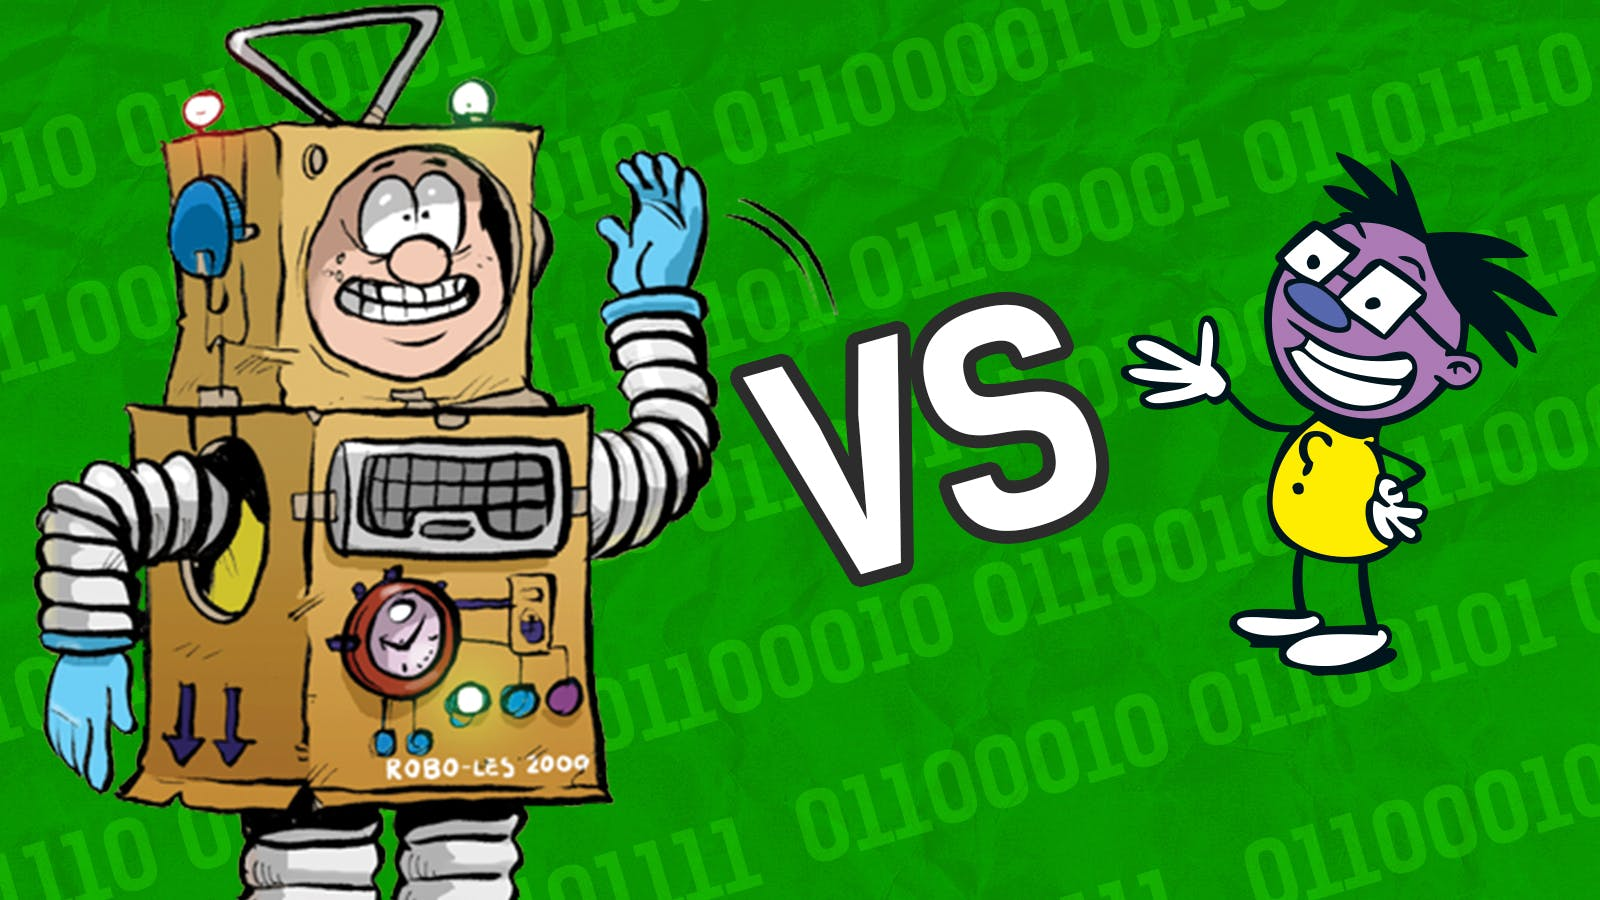 Ones or Zeroes - Les Pretend vs The Numskulls